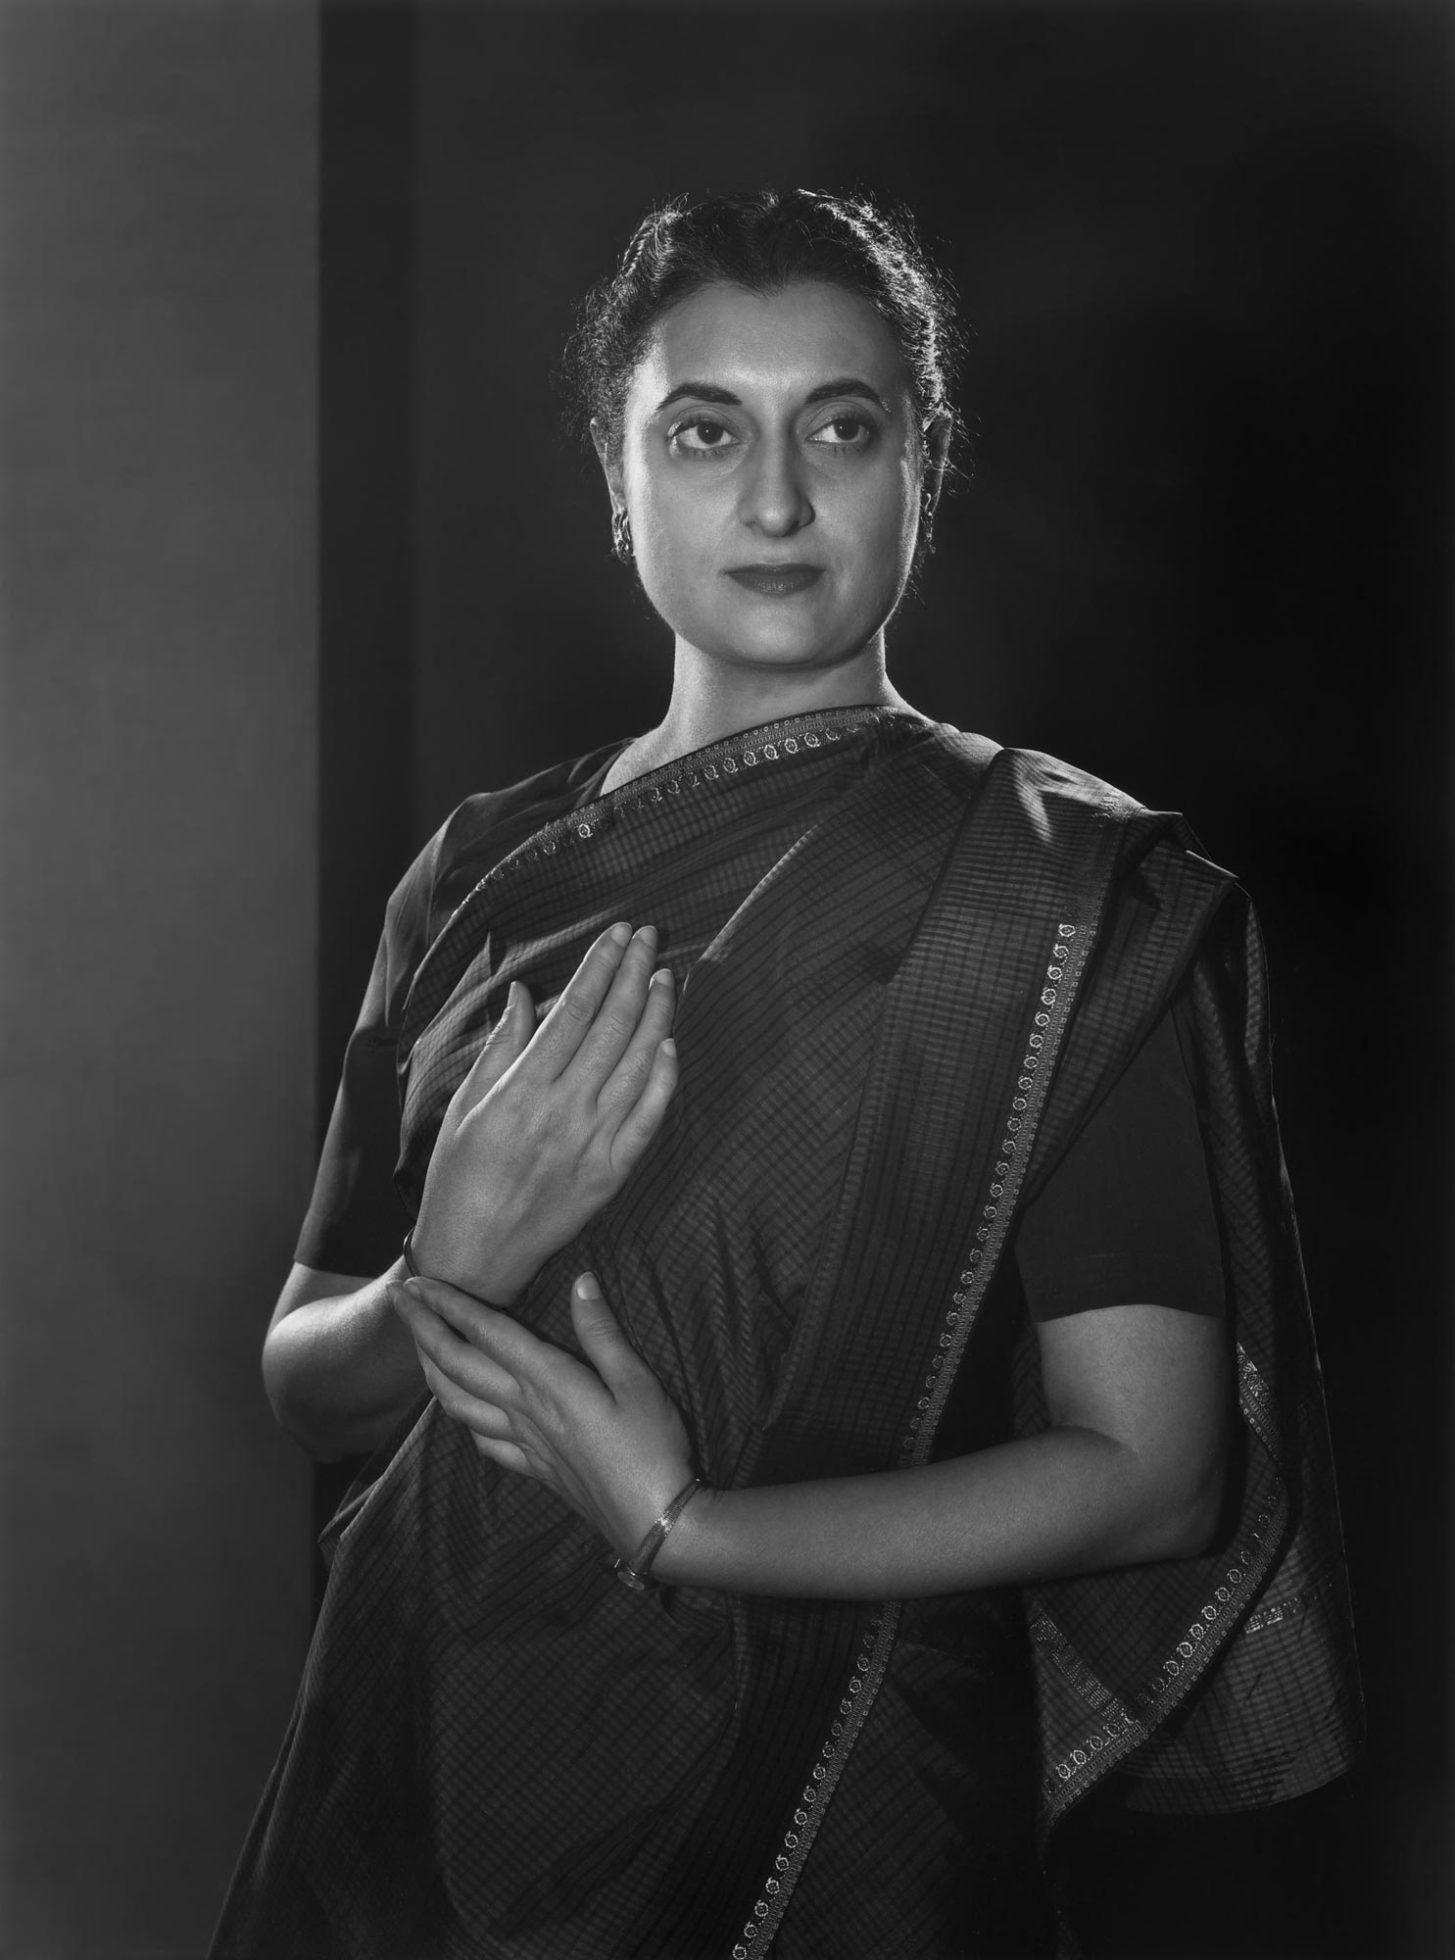 Fotó: Yousuf Karsh: Indira Gandhi, 1956 © Yousuf Karsh